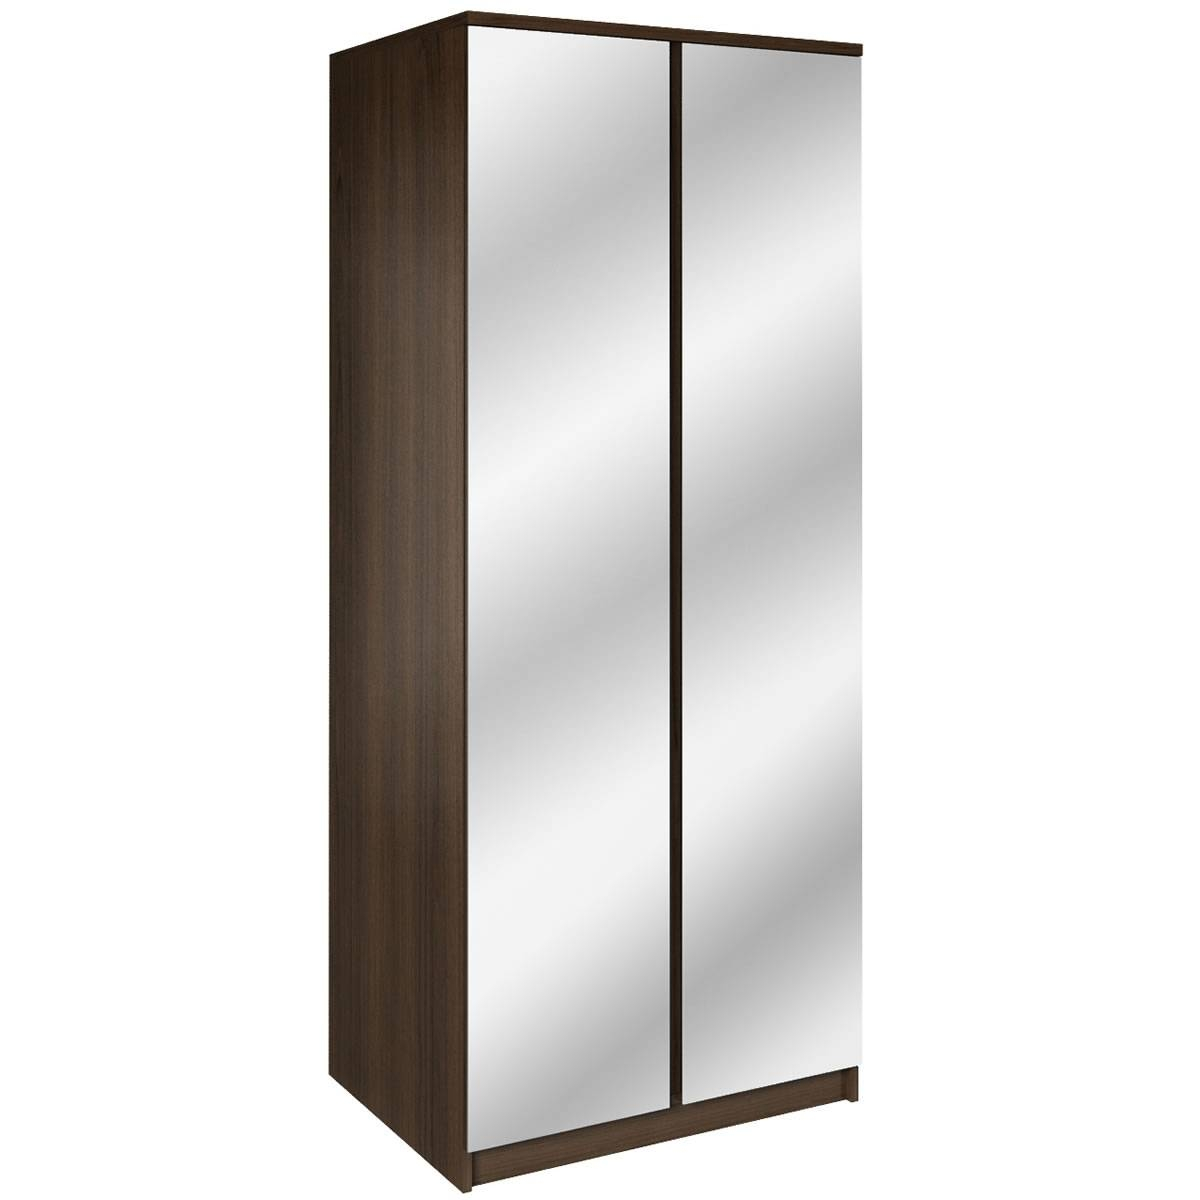 Closet Wardrobe Cheap | 2016 Closet Ideas & Designs In Cheap 2 Door Wardrobes (View 4 of 15)